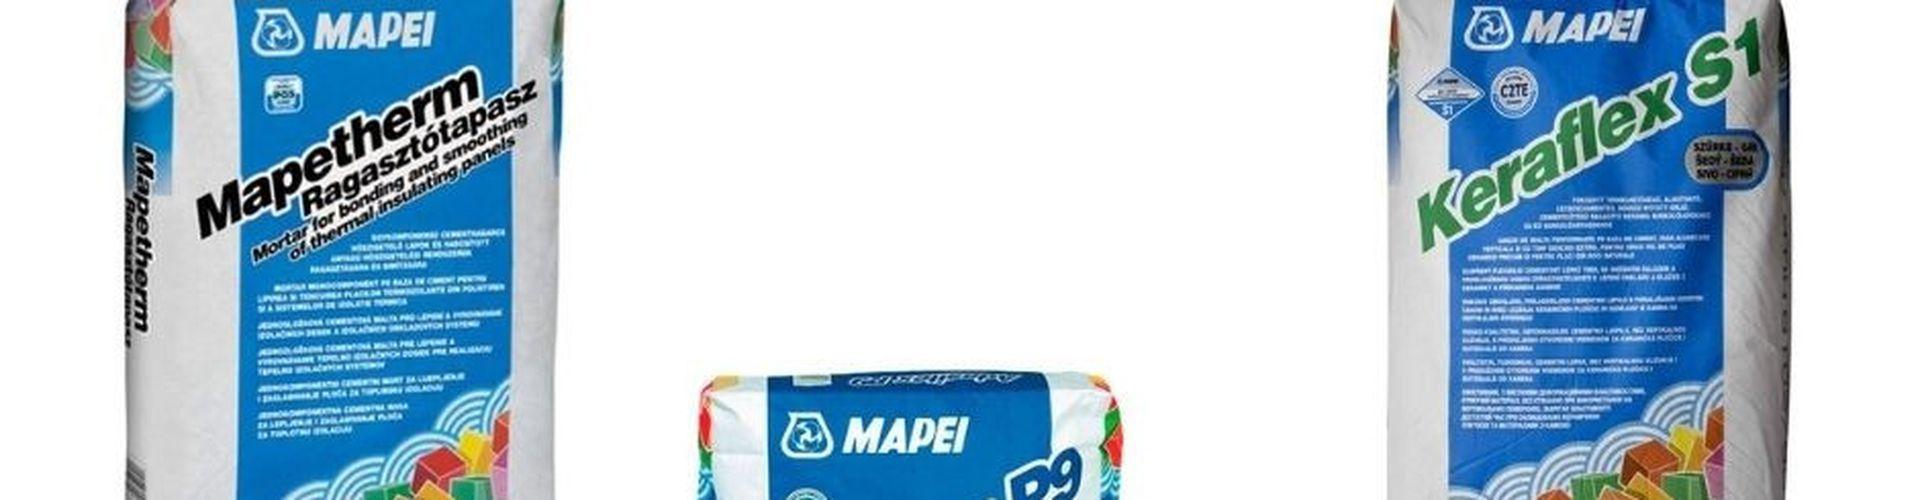 MAPEI AKCIÓ